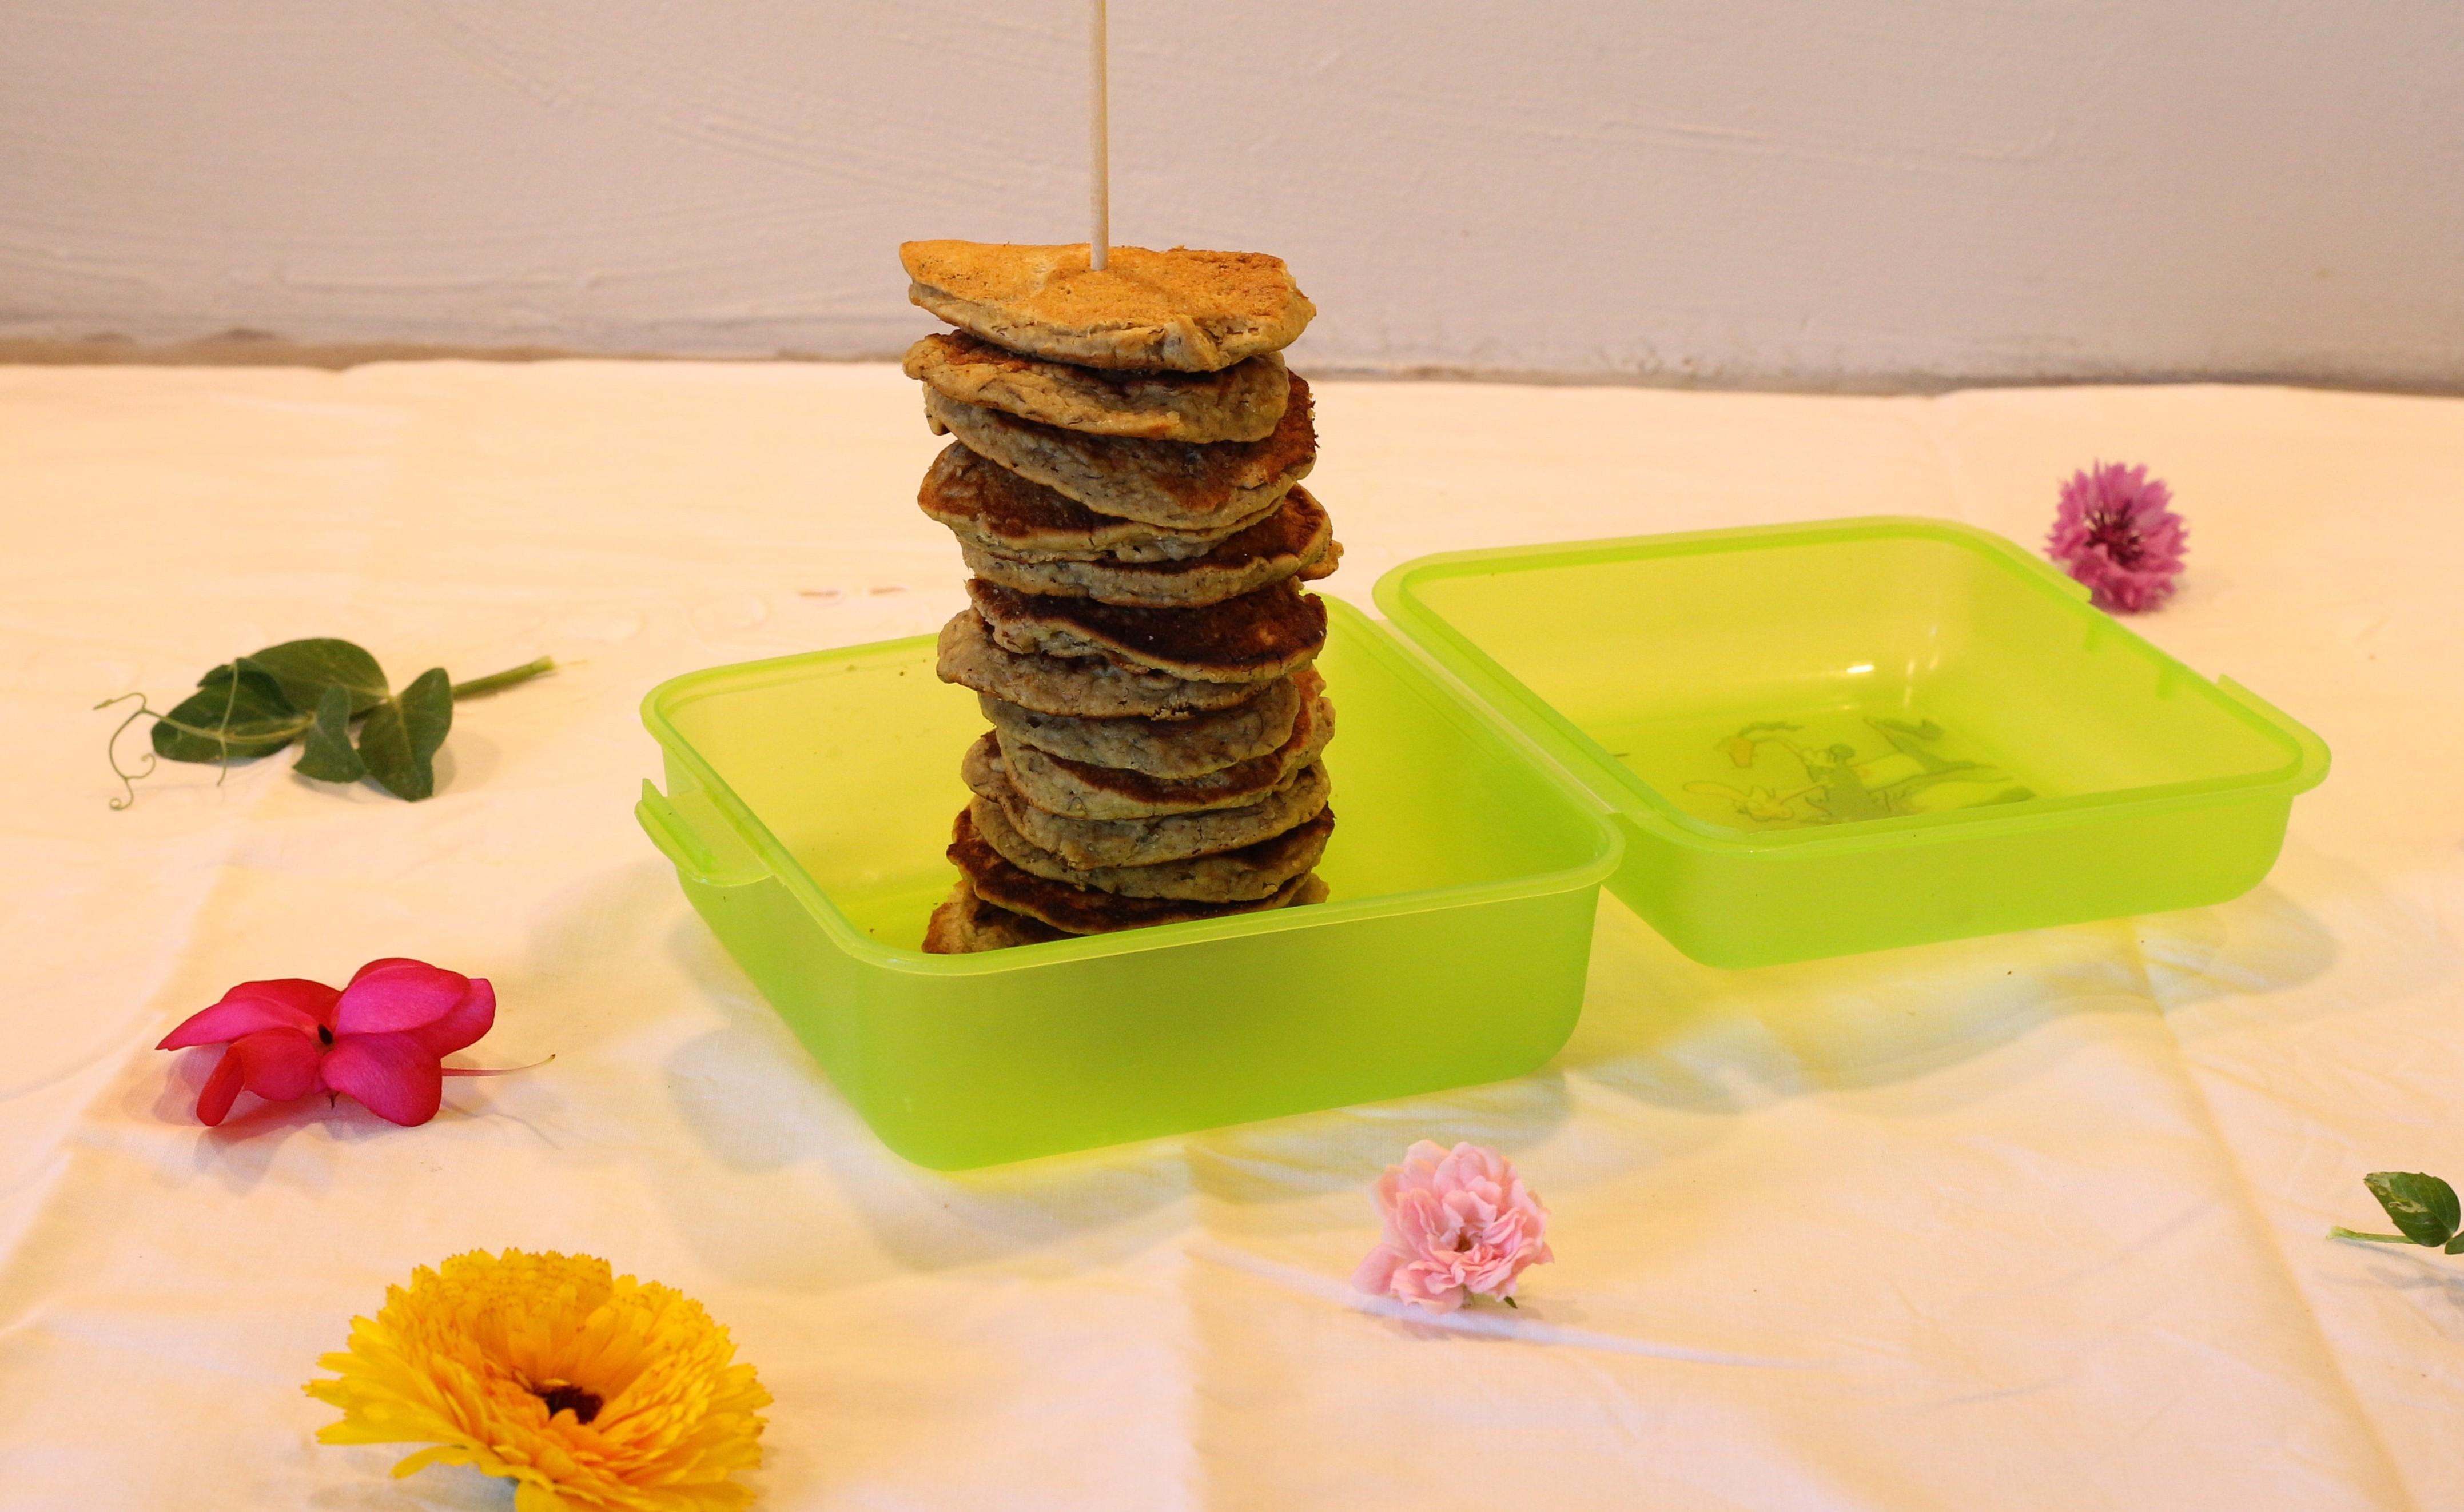 Glutenfri og laktosefri sunde havrepandekager i madpakken eller til morgenmad